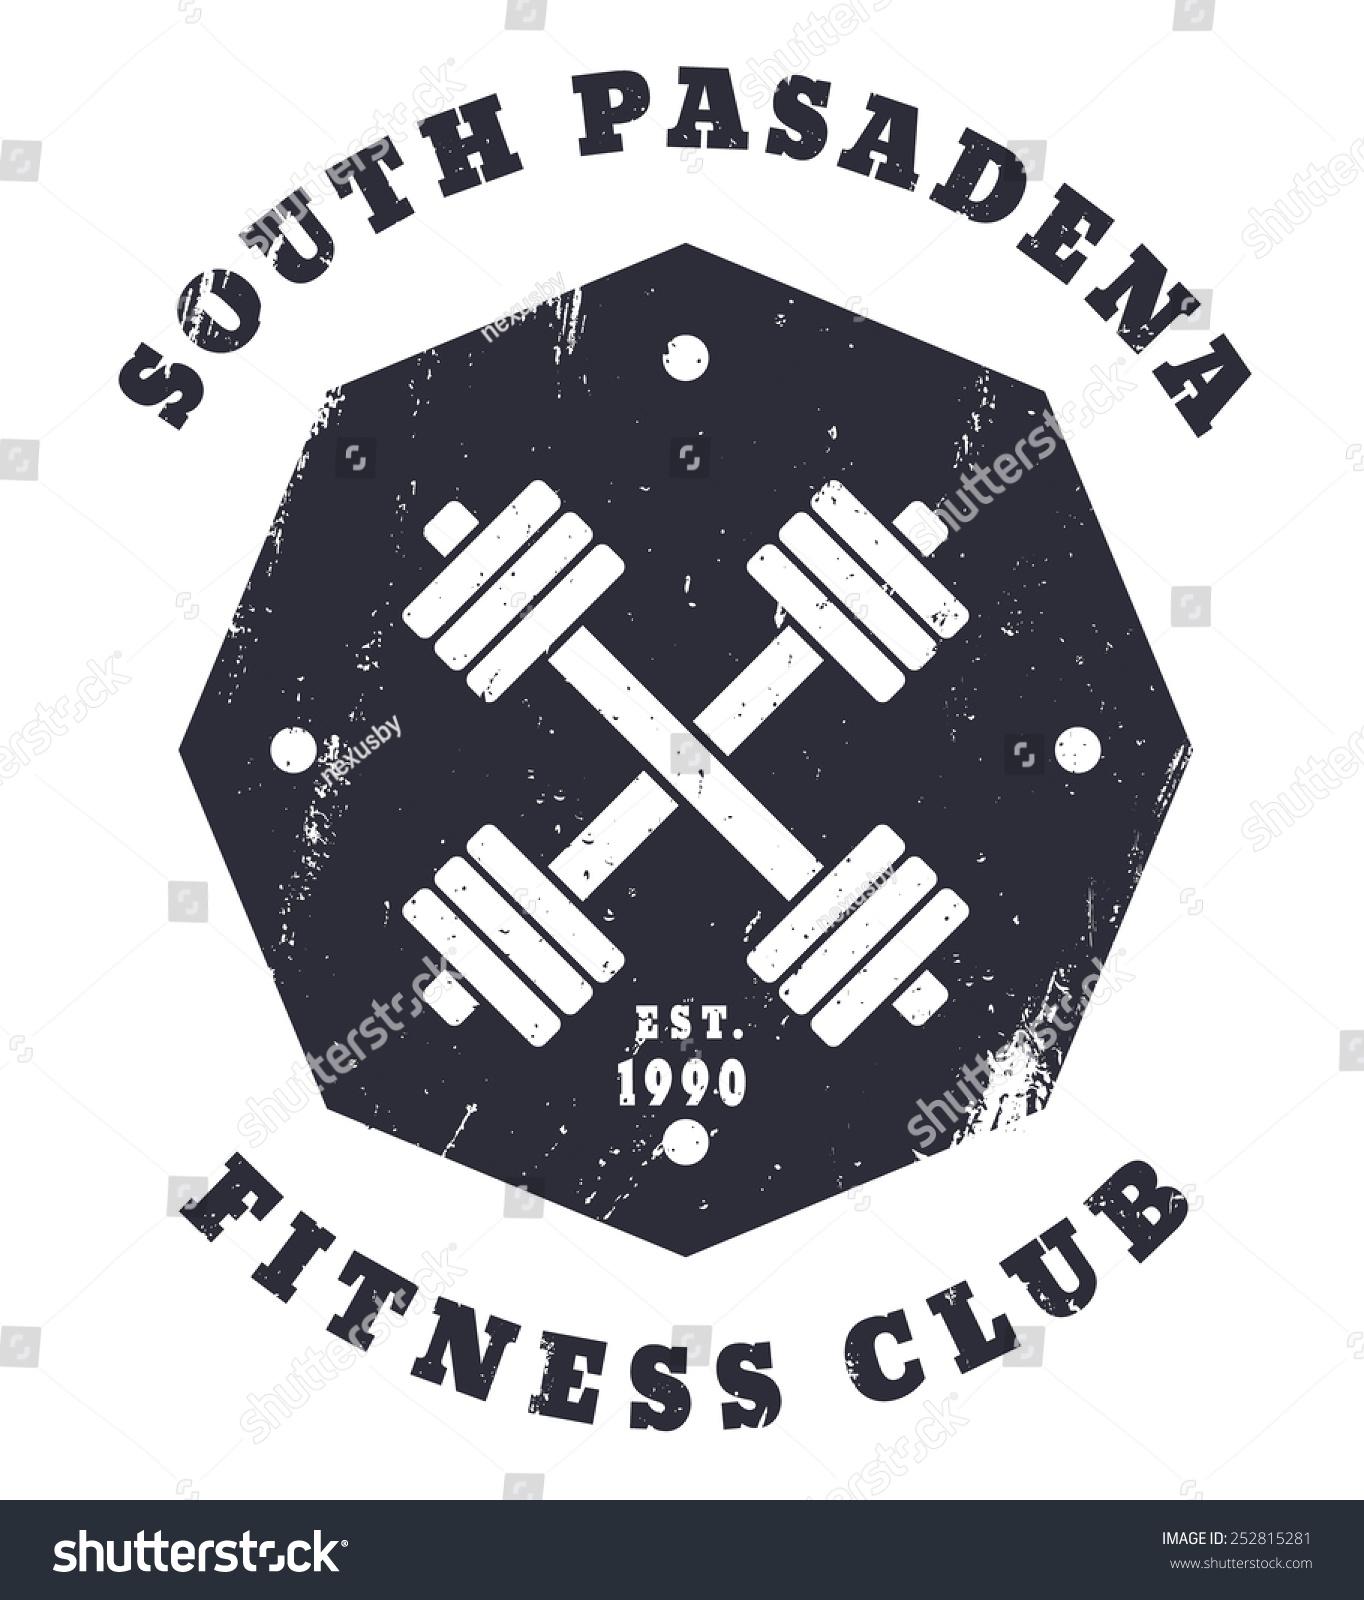 Shirt design easy - South Pasadena Fitness Club T Shirt Design Vector Illustration Eps10 Easy To Edit